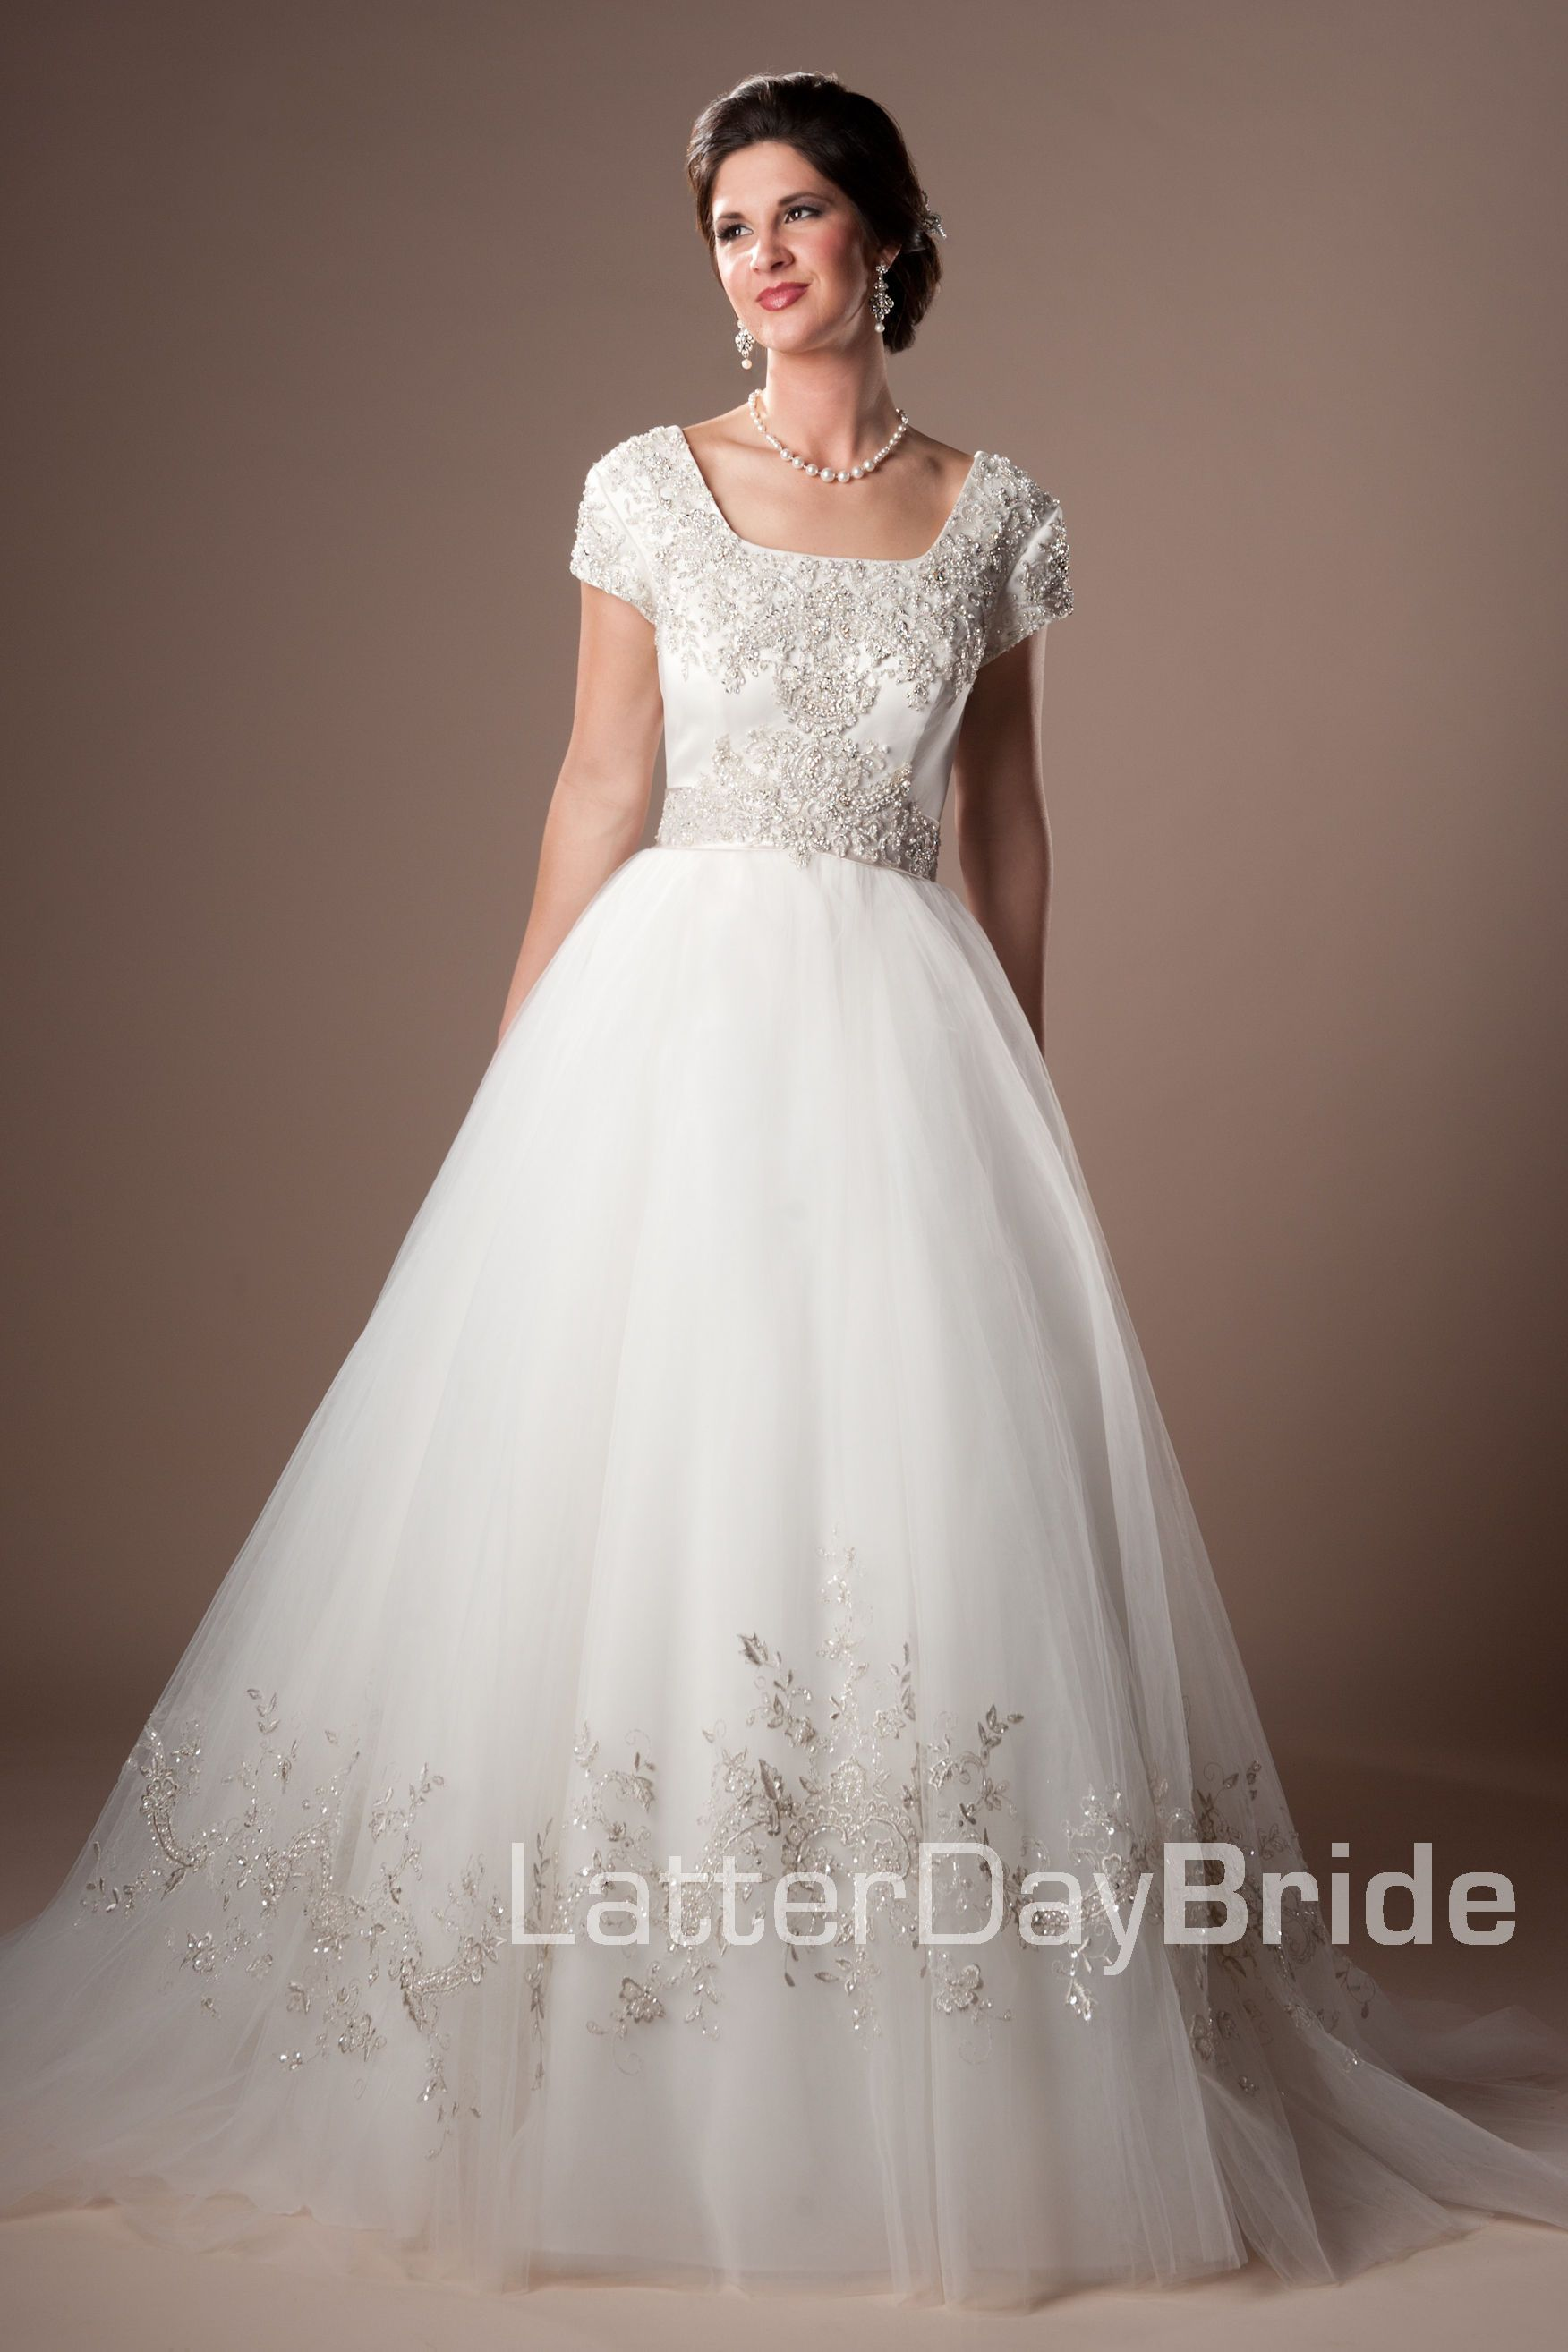 Modest Wedding Dress Elisamarie Latterdaybride Prom Modest